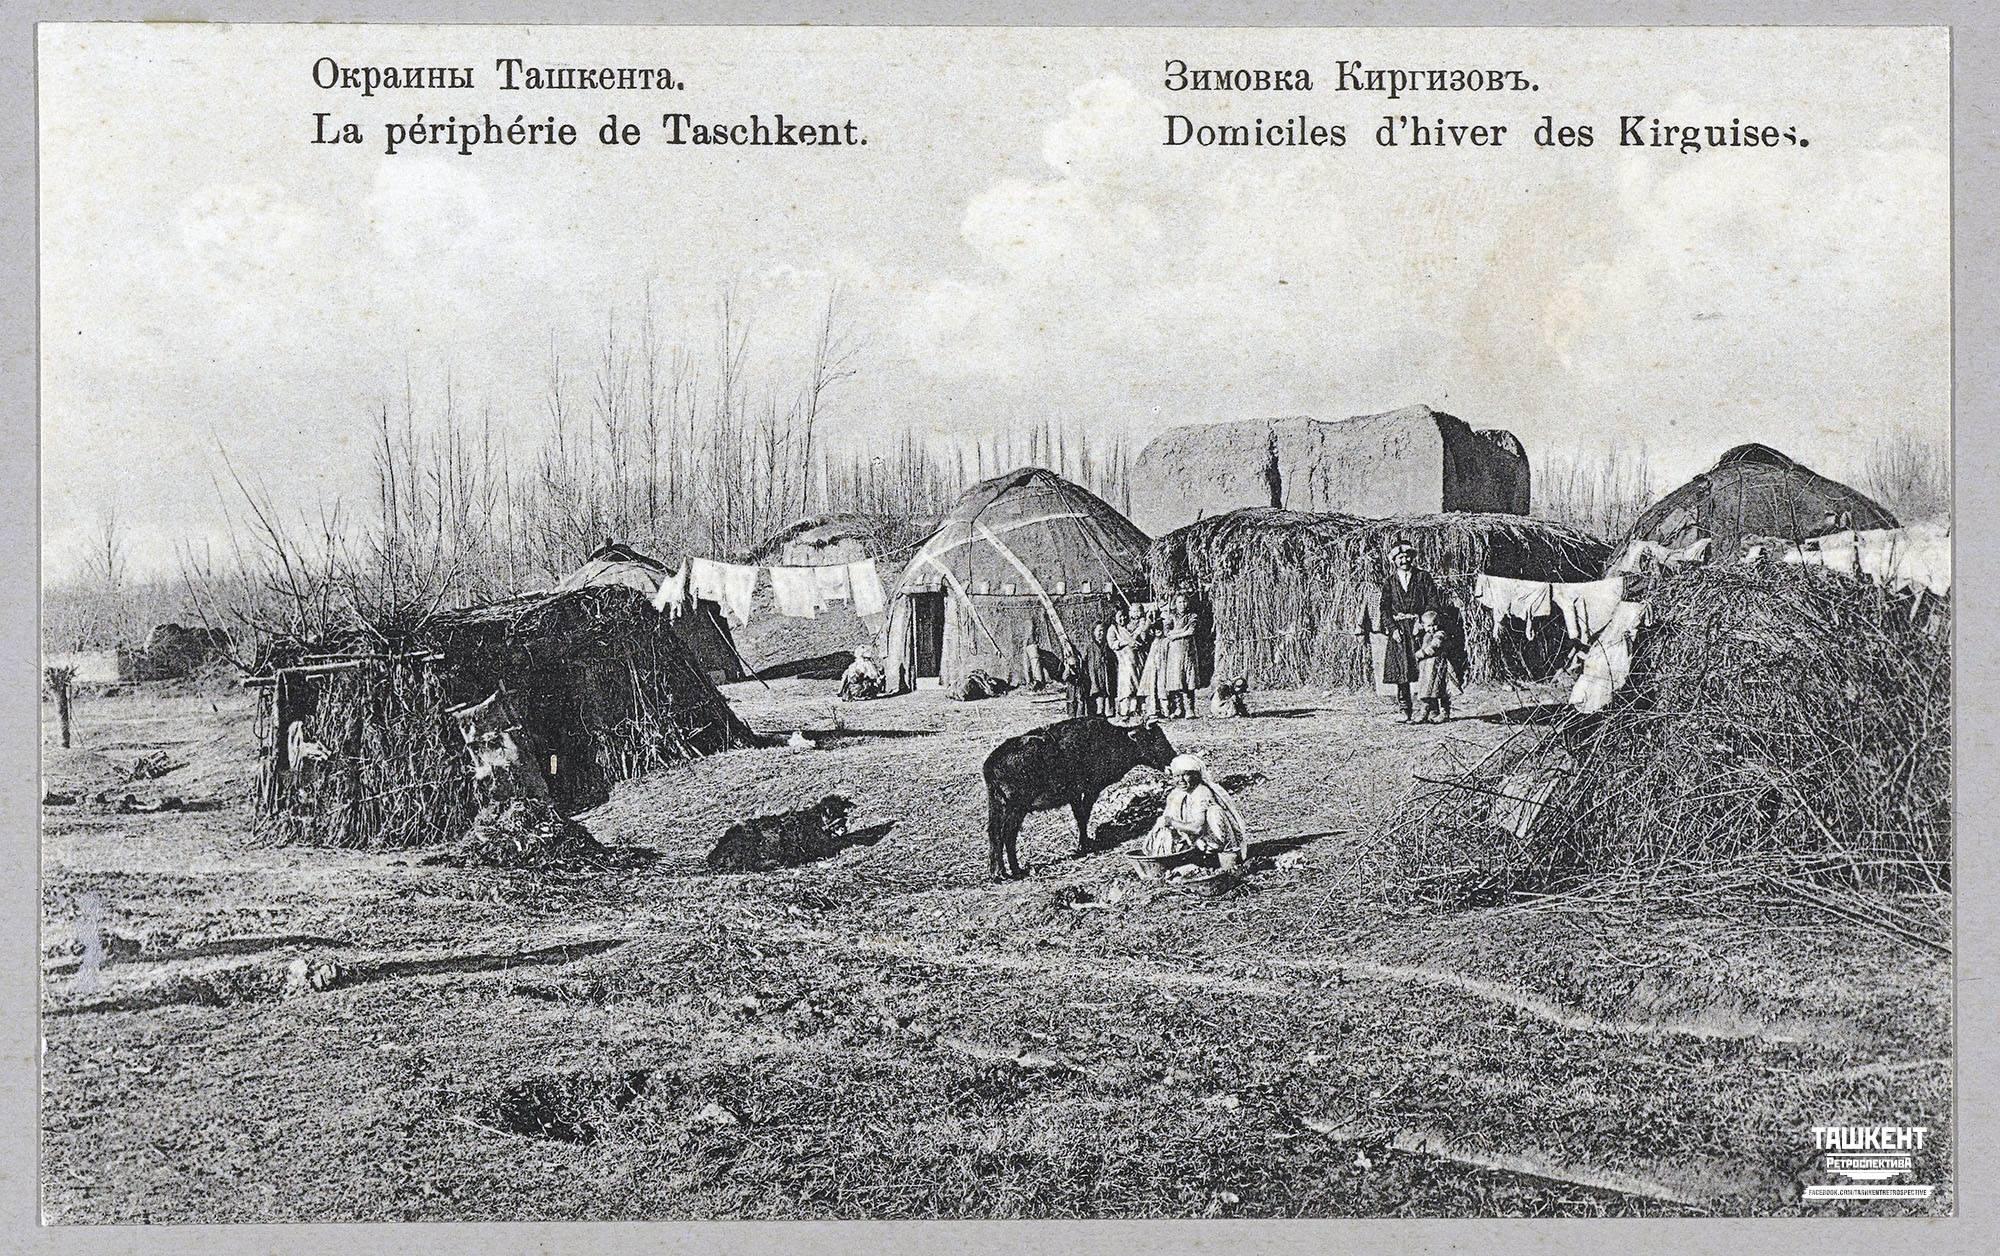 Окраины Ташкента. Зимовка Киргизов